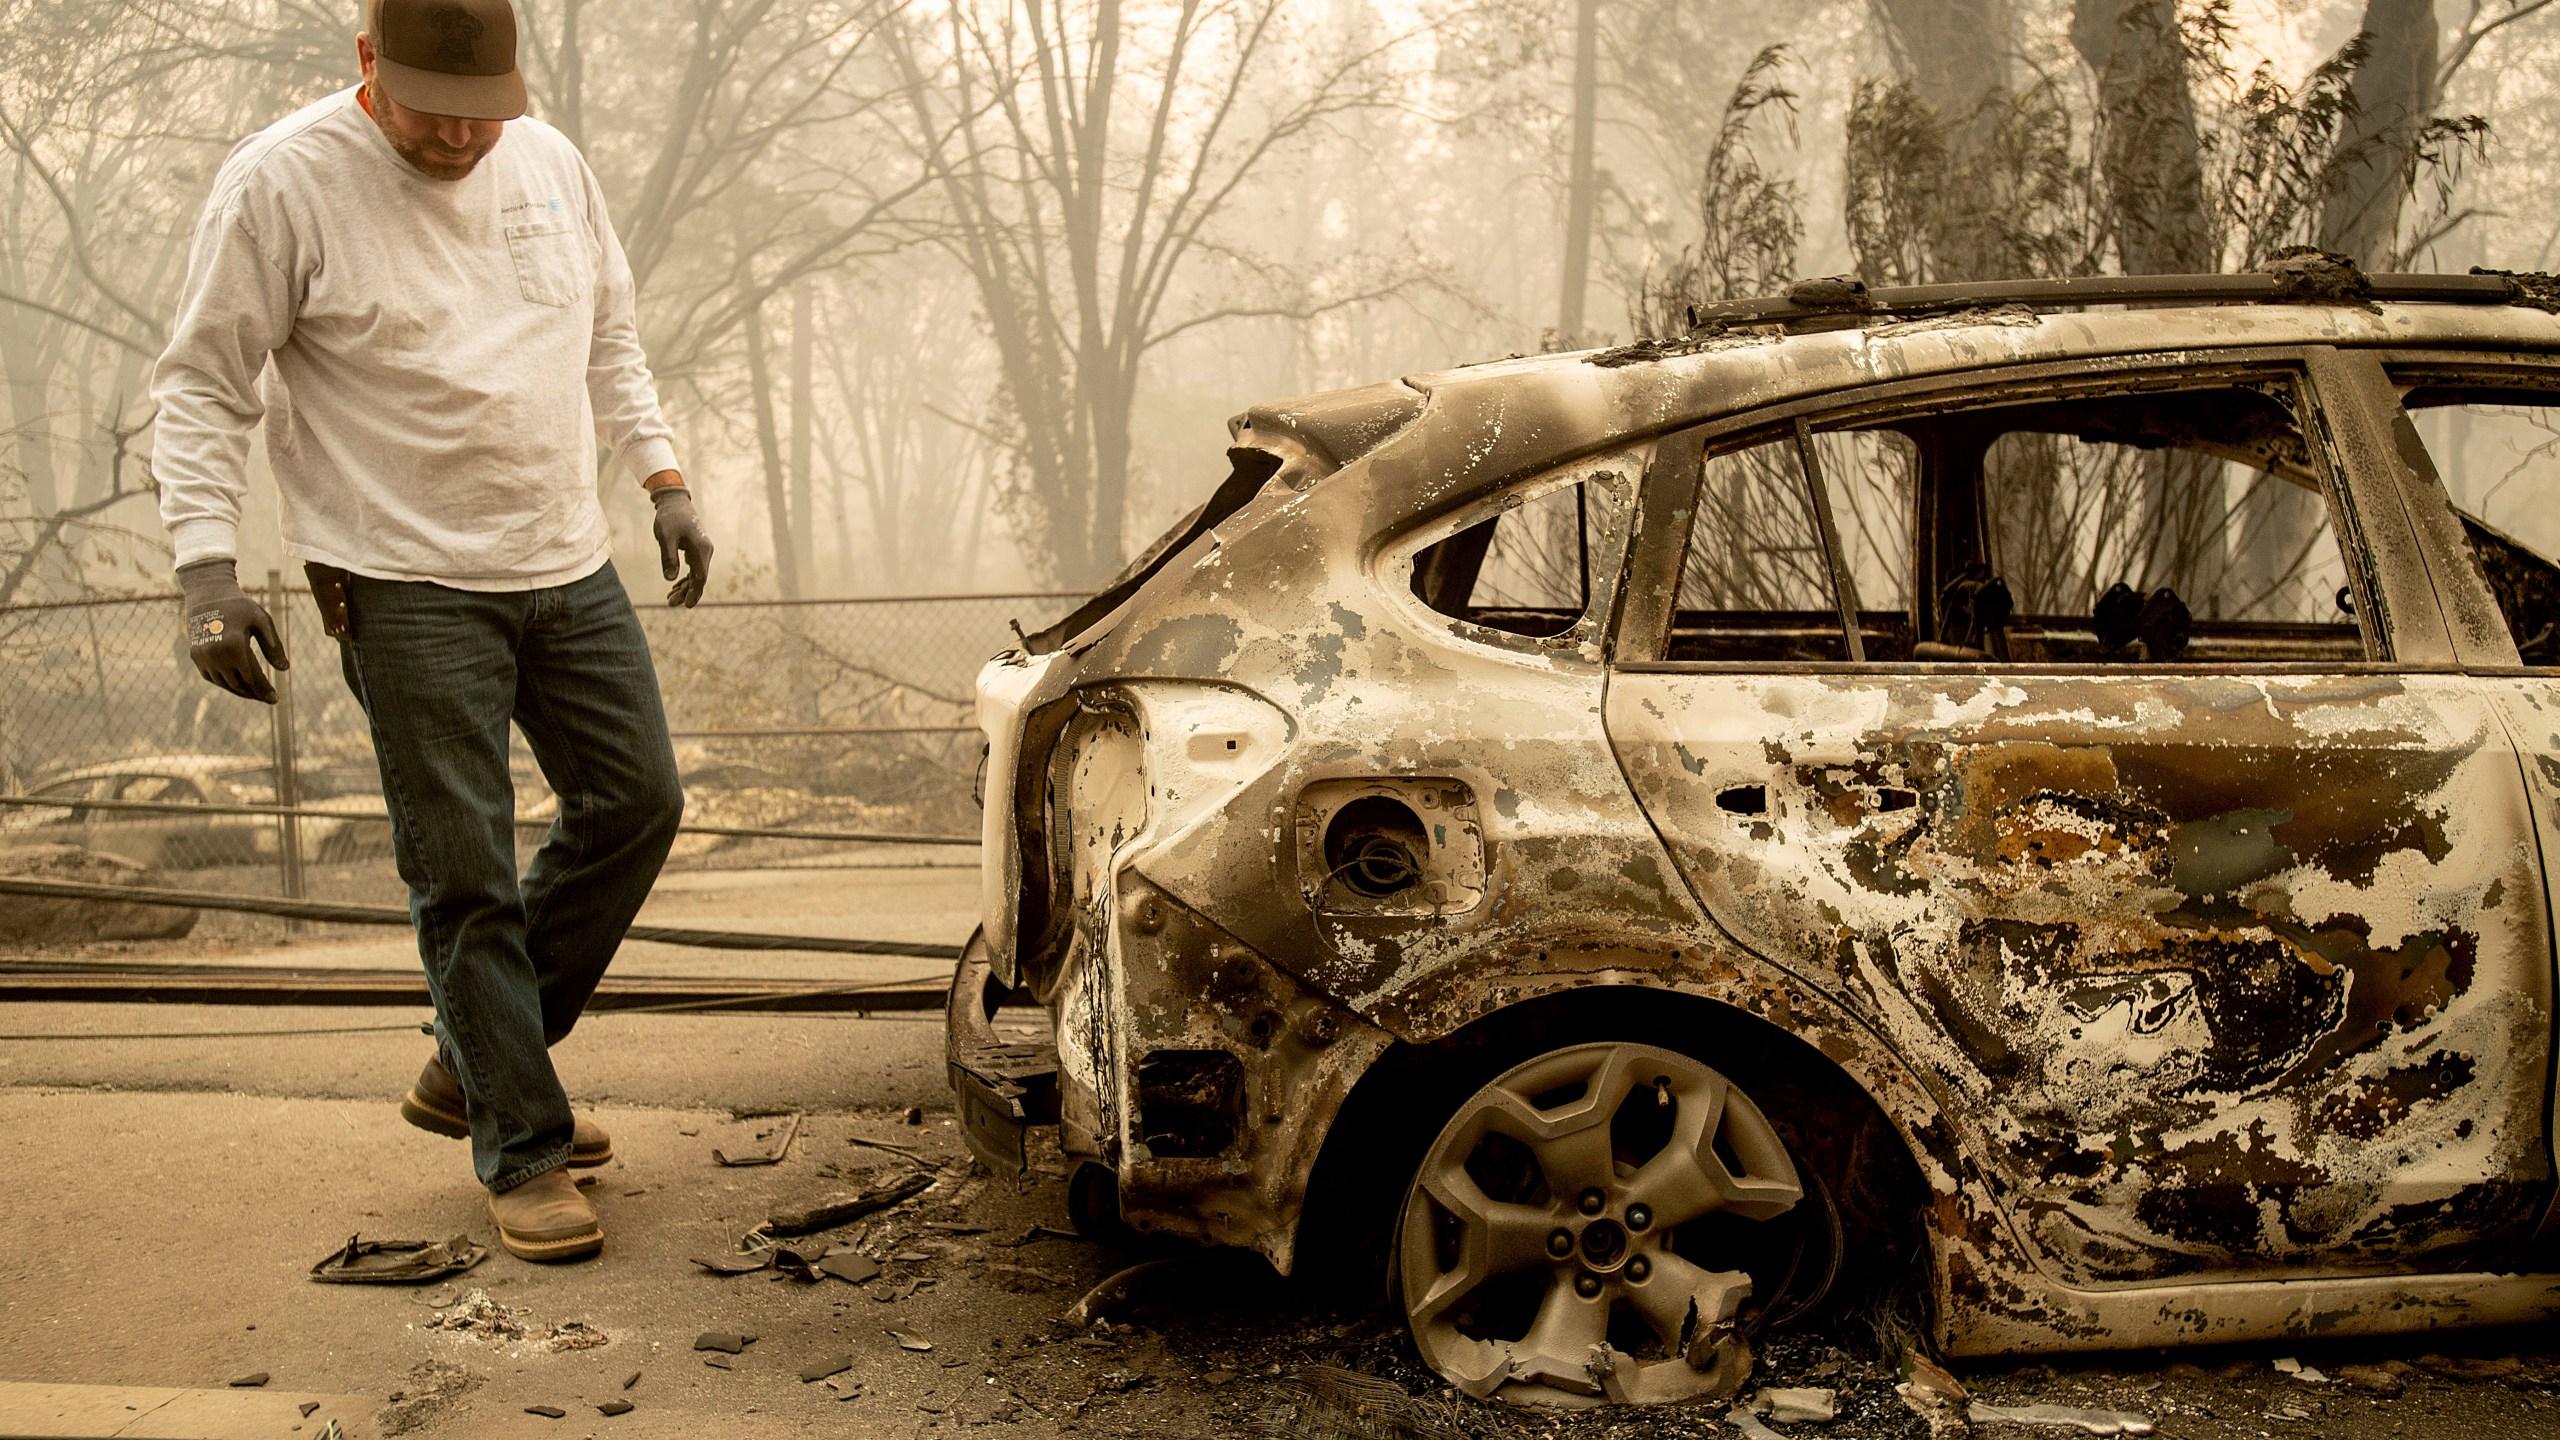 APTOPIX_California_Wildfires_43522-159532.jpg38066901